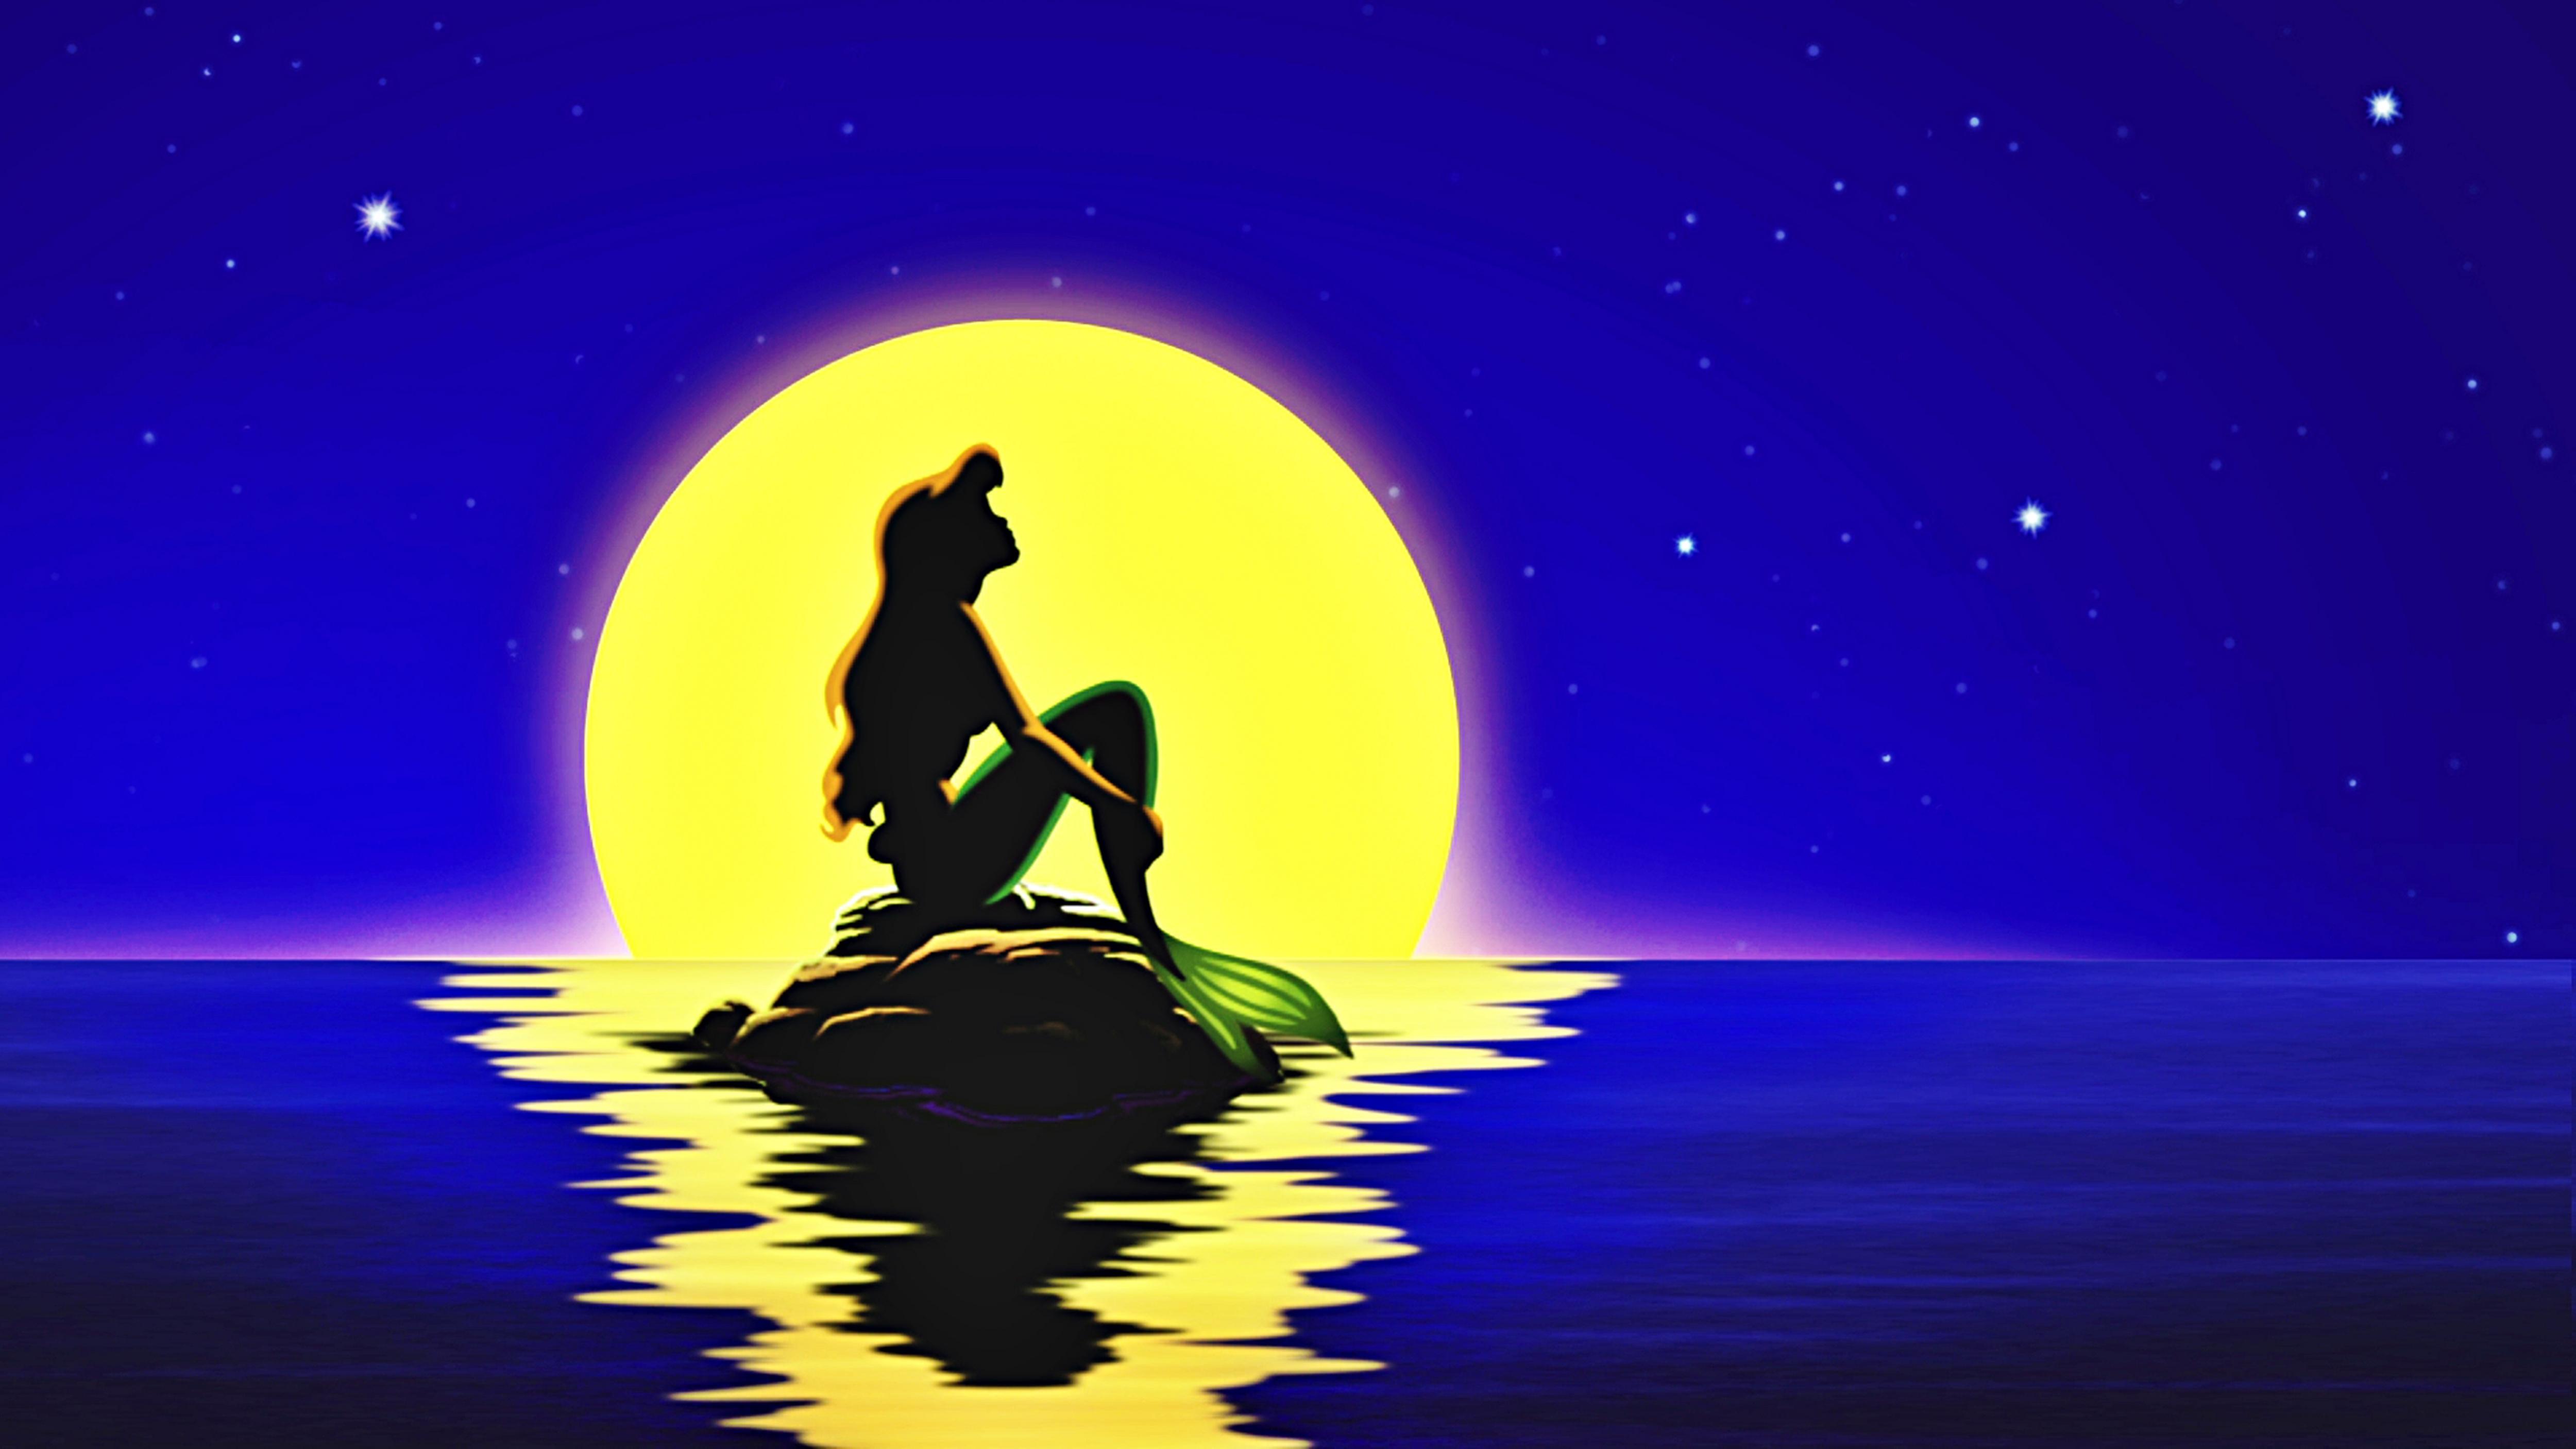 Walt Disney Characters image walt disney characters 36280648 5000 2813 5000x2813